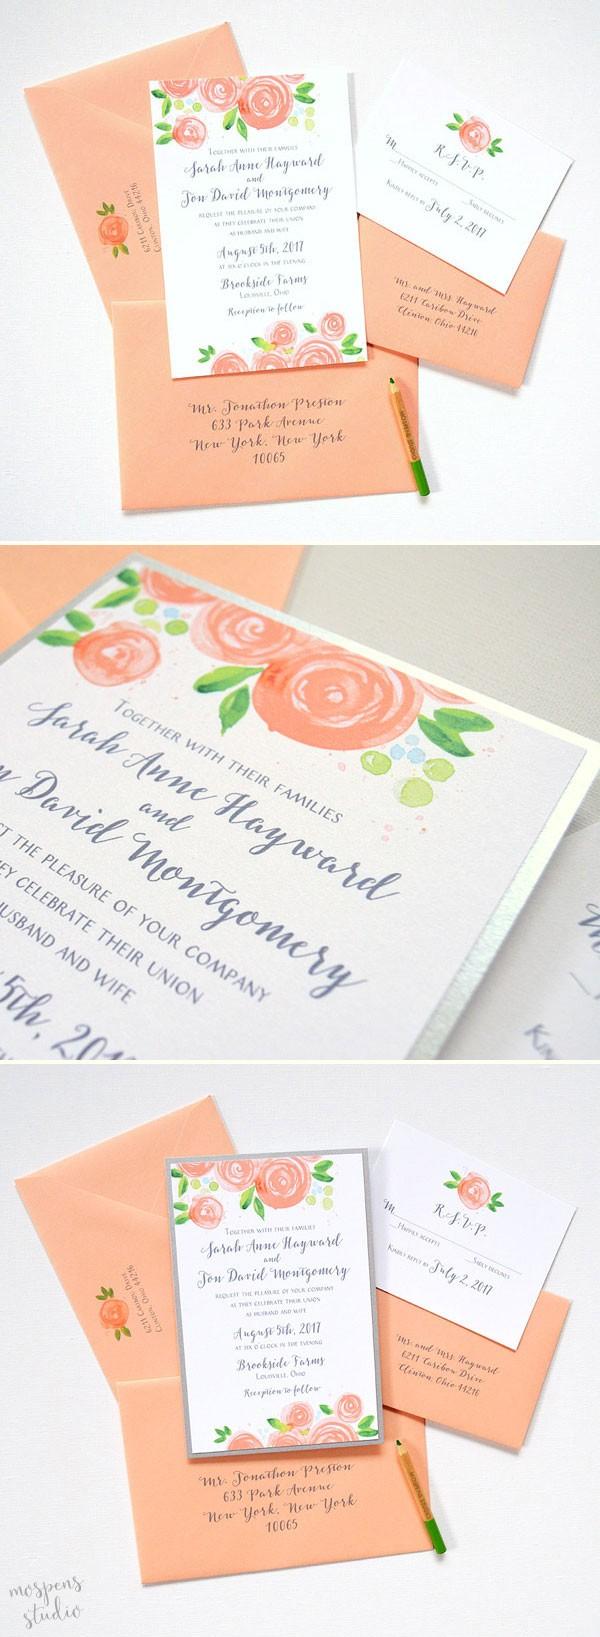 So pretty! Peach rose blooms wedding invitations by artist Michelle Mospens. 100% original watercolor art. - www.mospensstudio.com